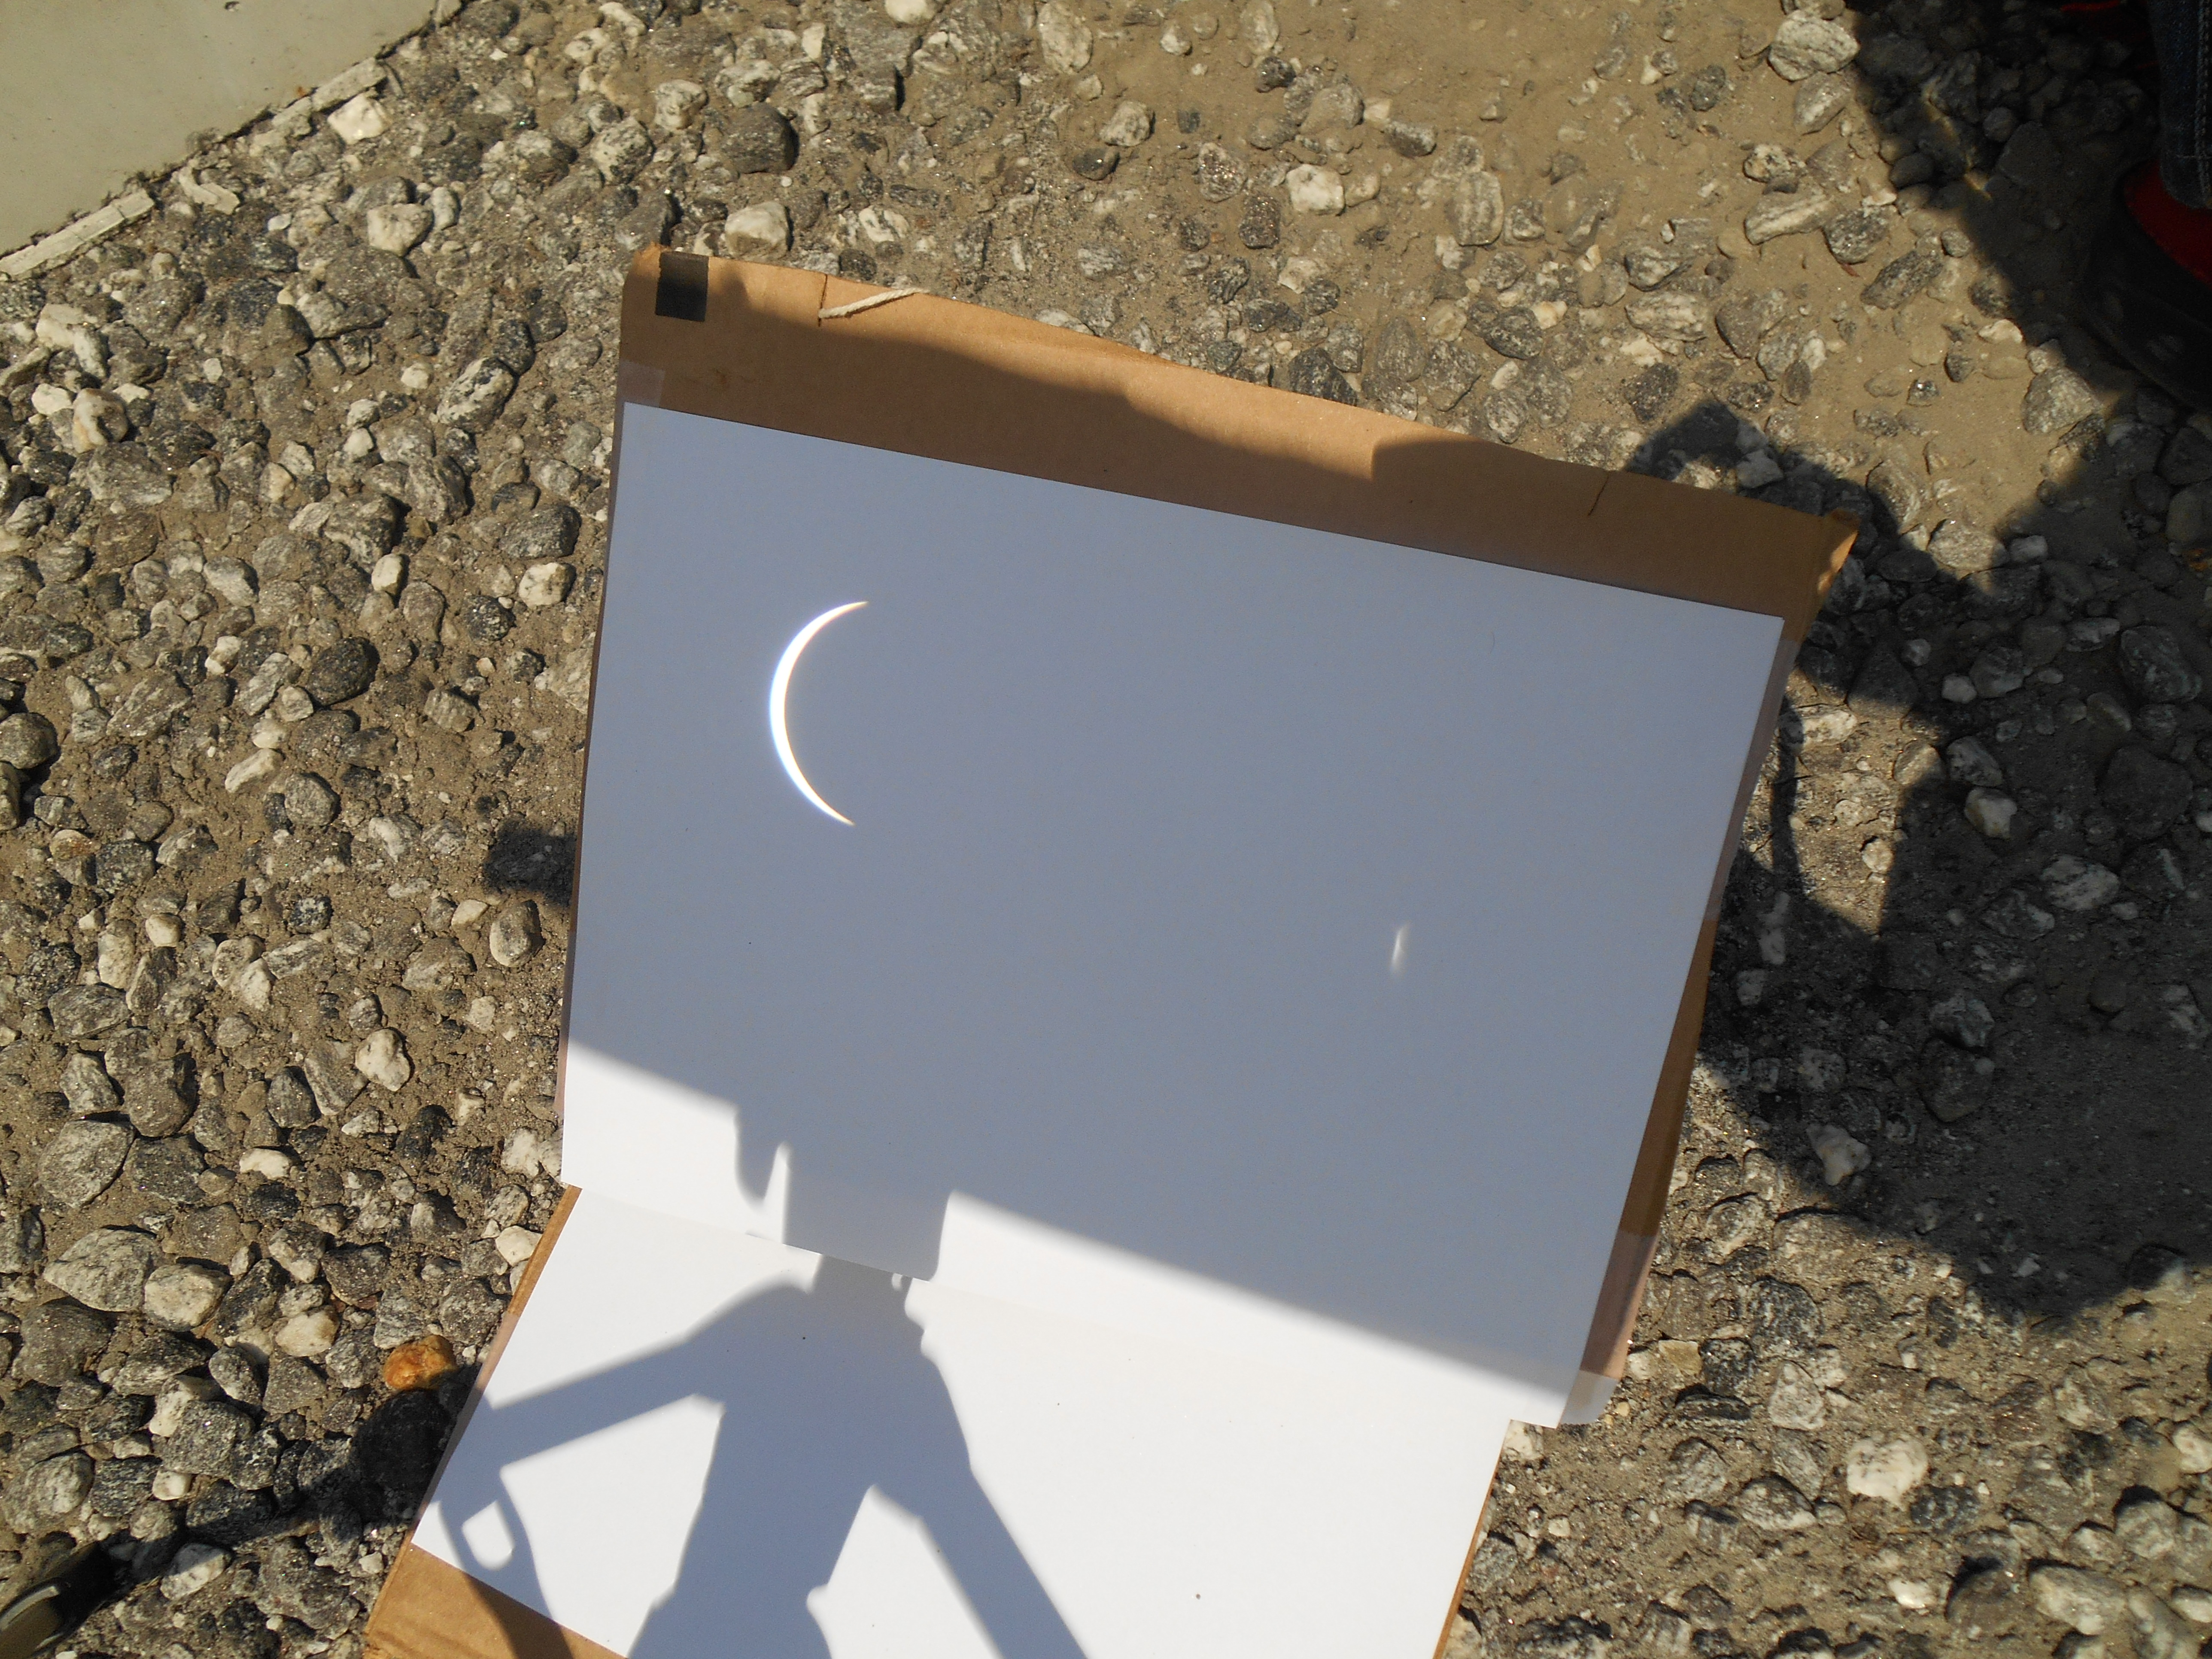 Solar Eclipse 8.21.2017 068